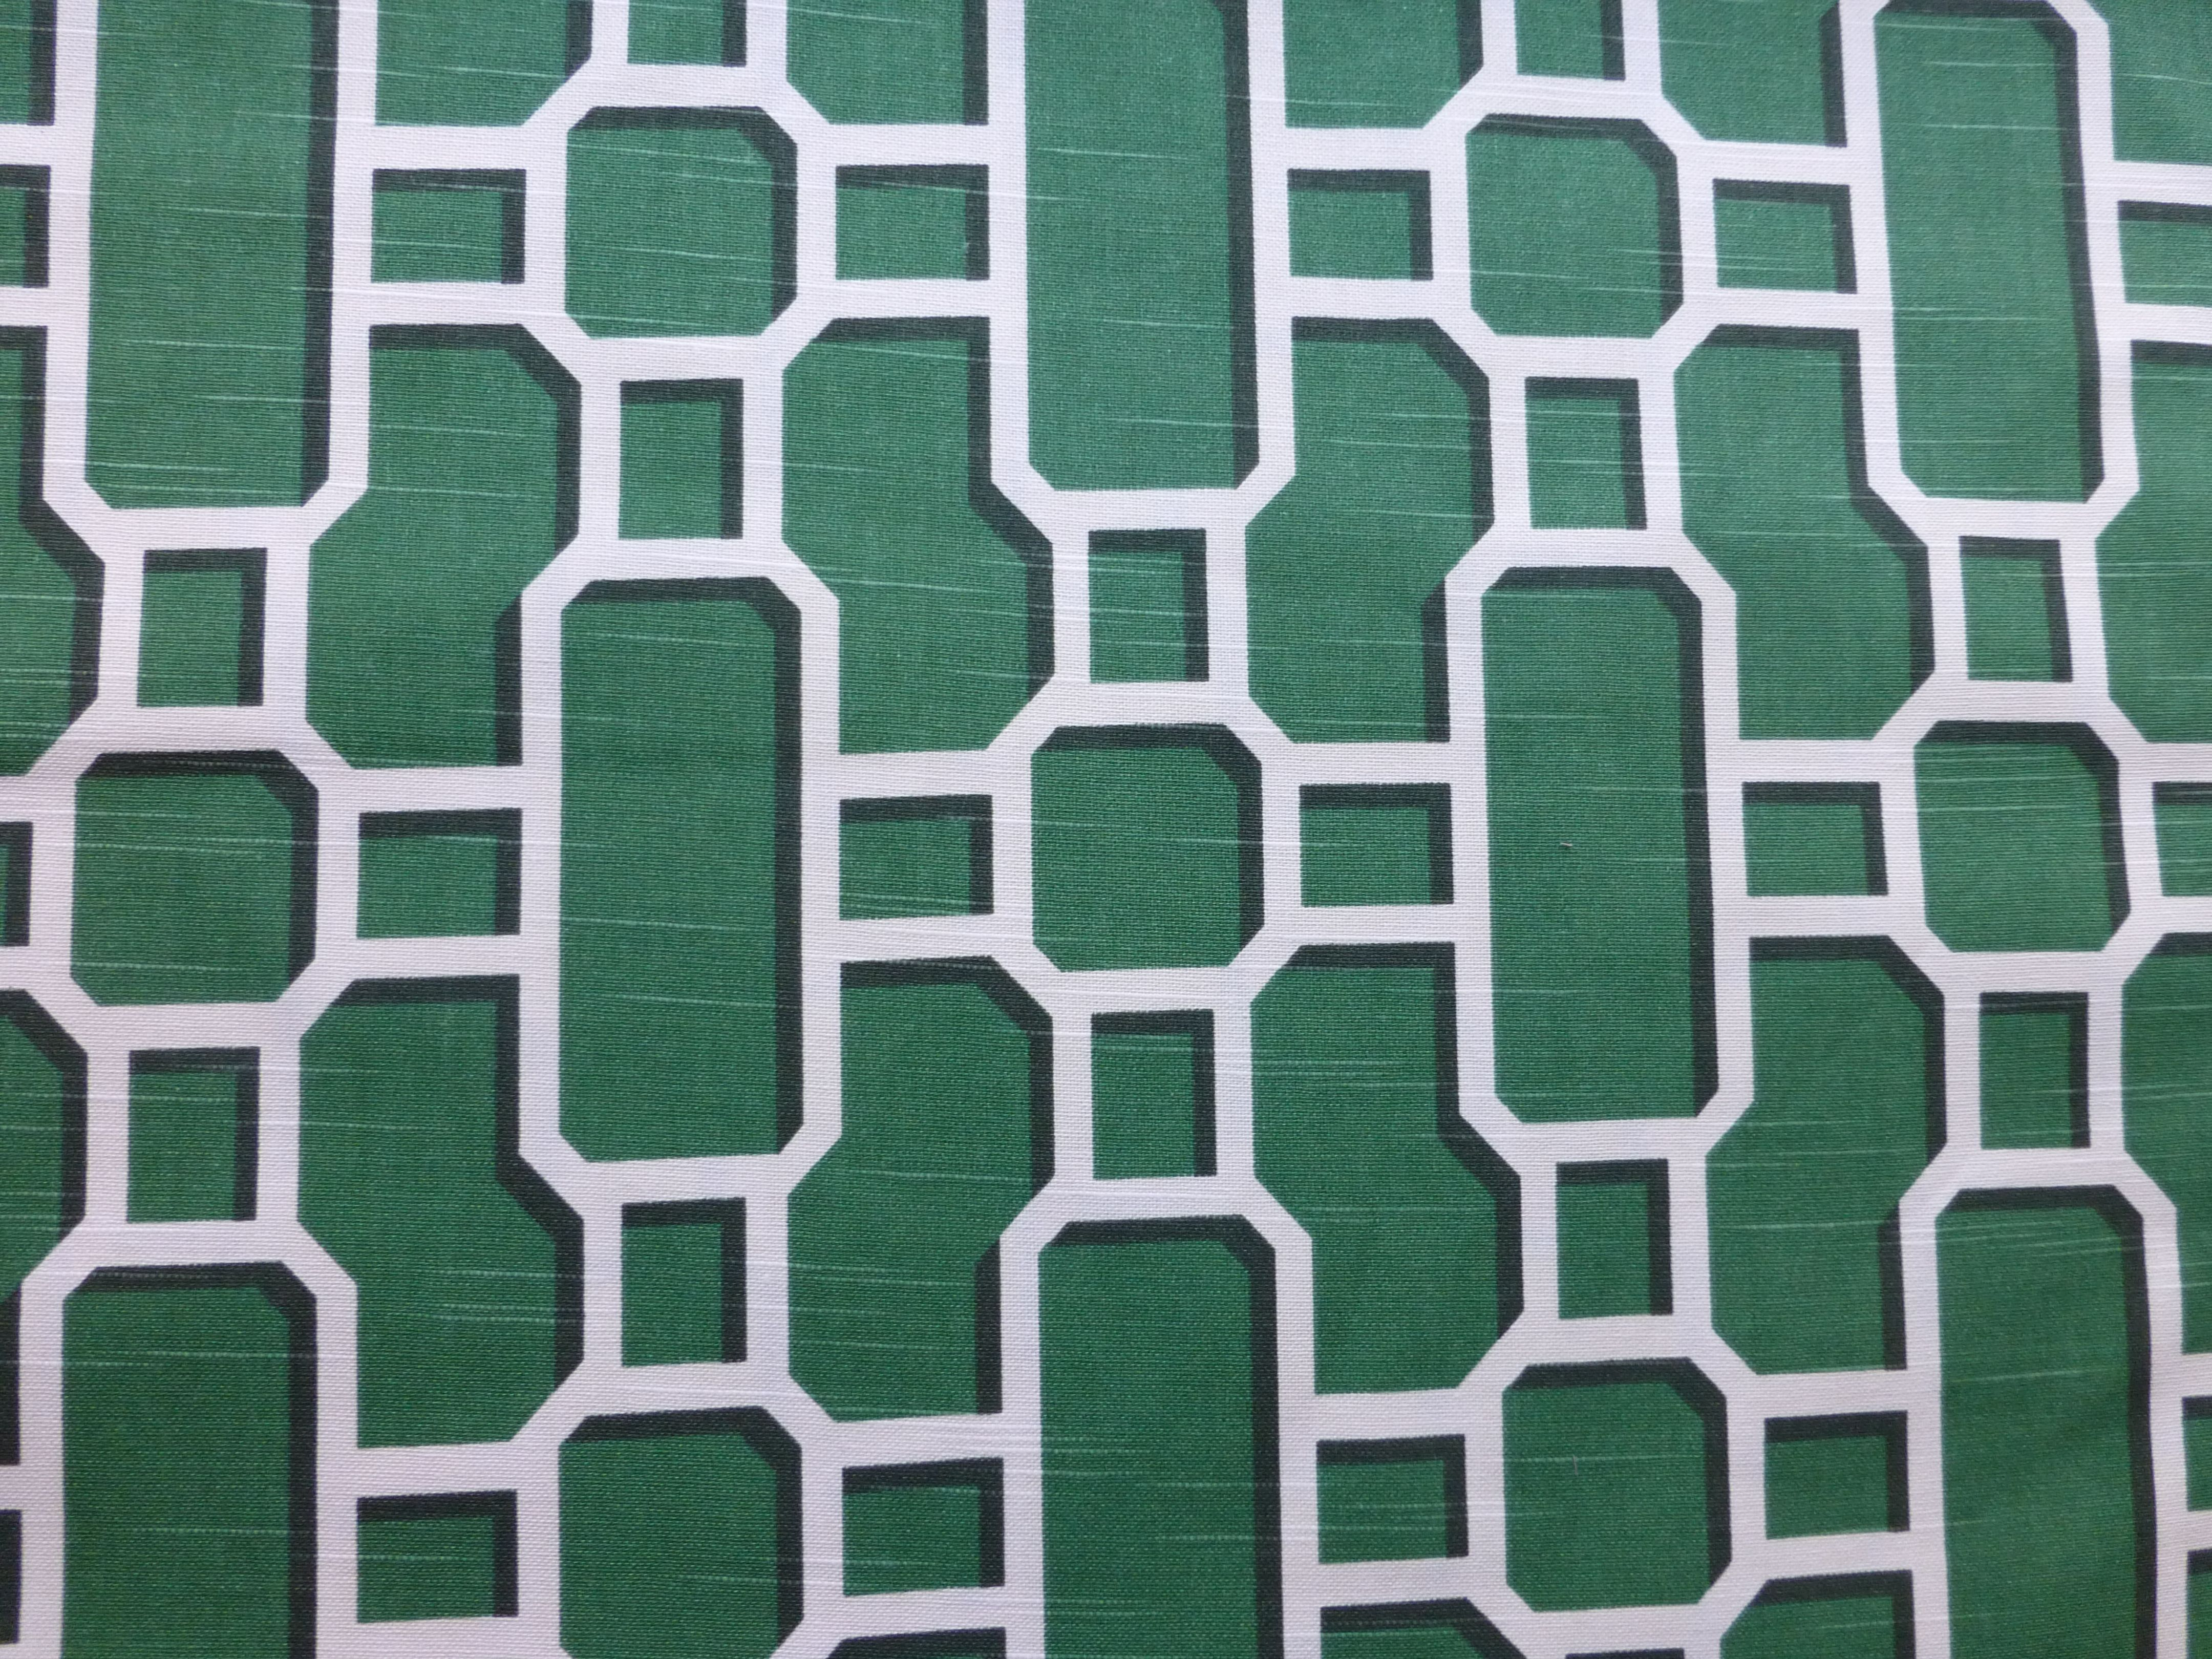 bc0d9e77d1d9babc56ce63fa249945b2 Meilleur De De Parasol Design Concept